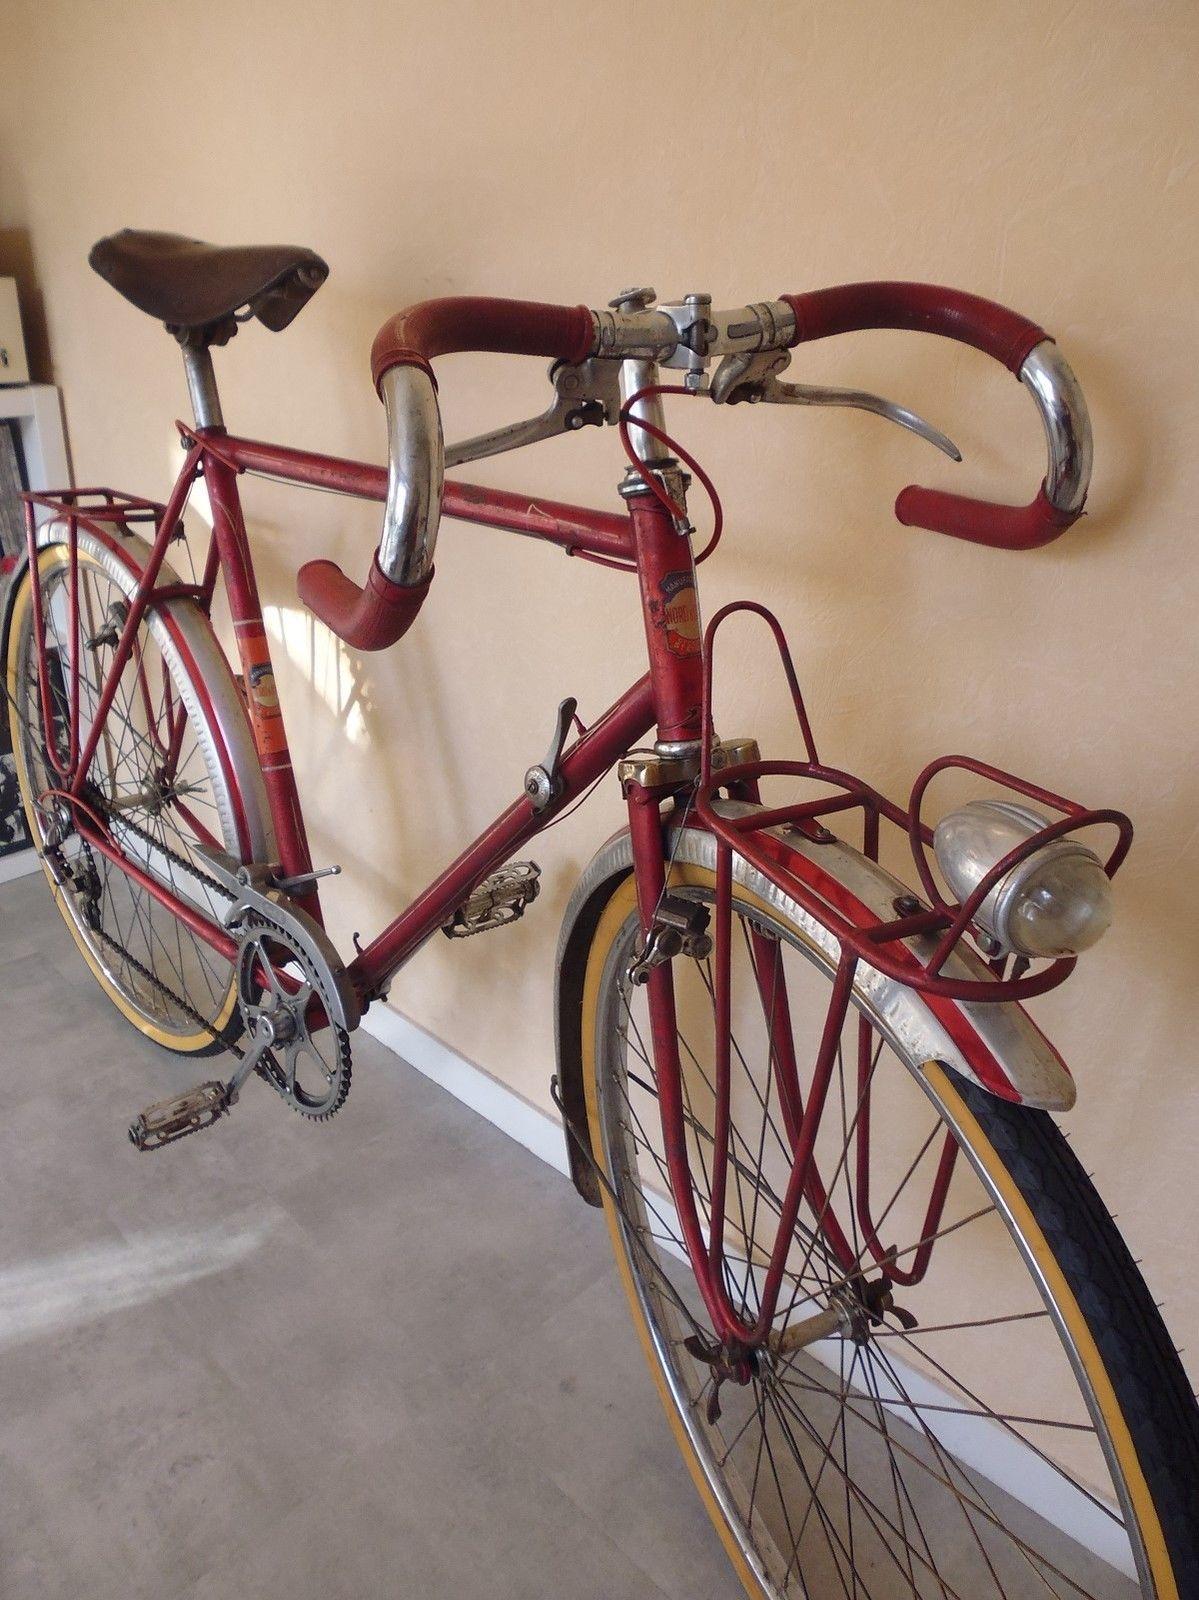 Superbe Randonneur 1950 Routens Herse Singer French Bike Collection Randonneur Bike Touring Bike Bike